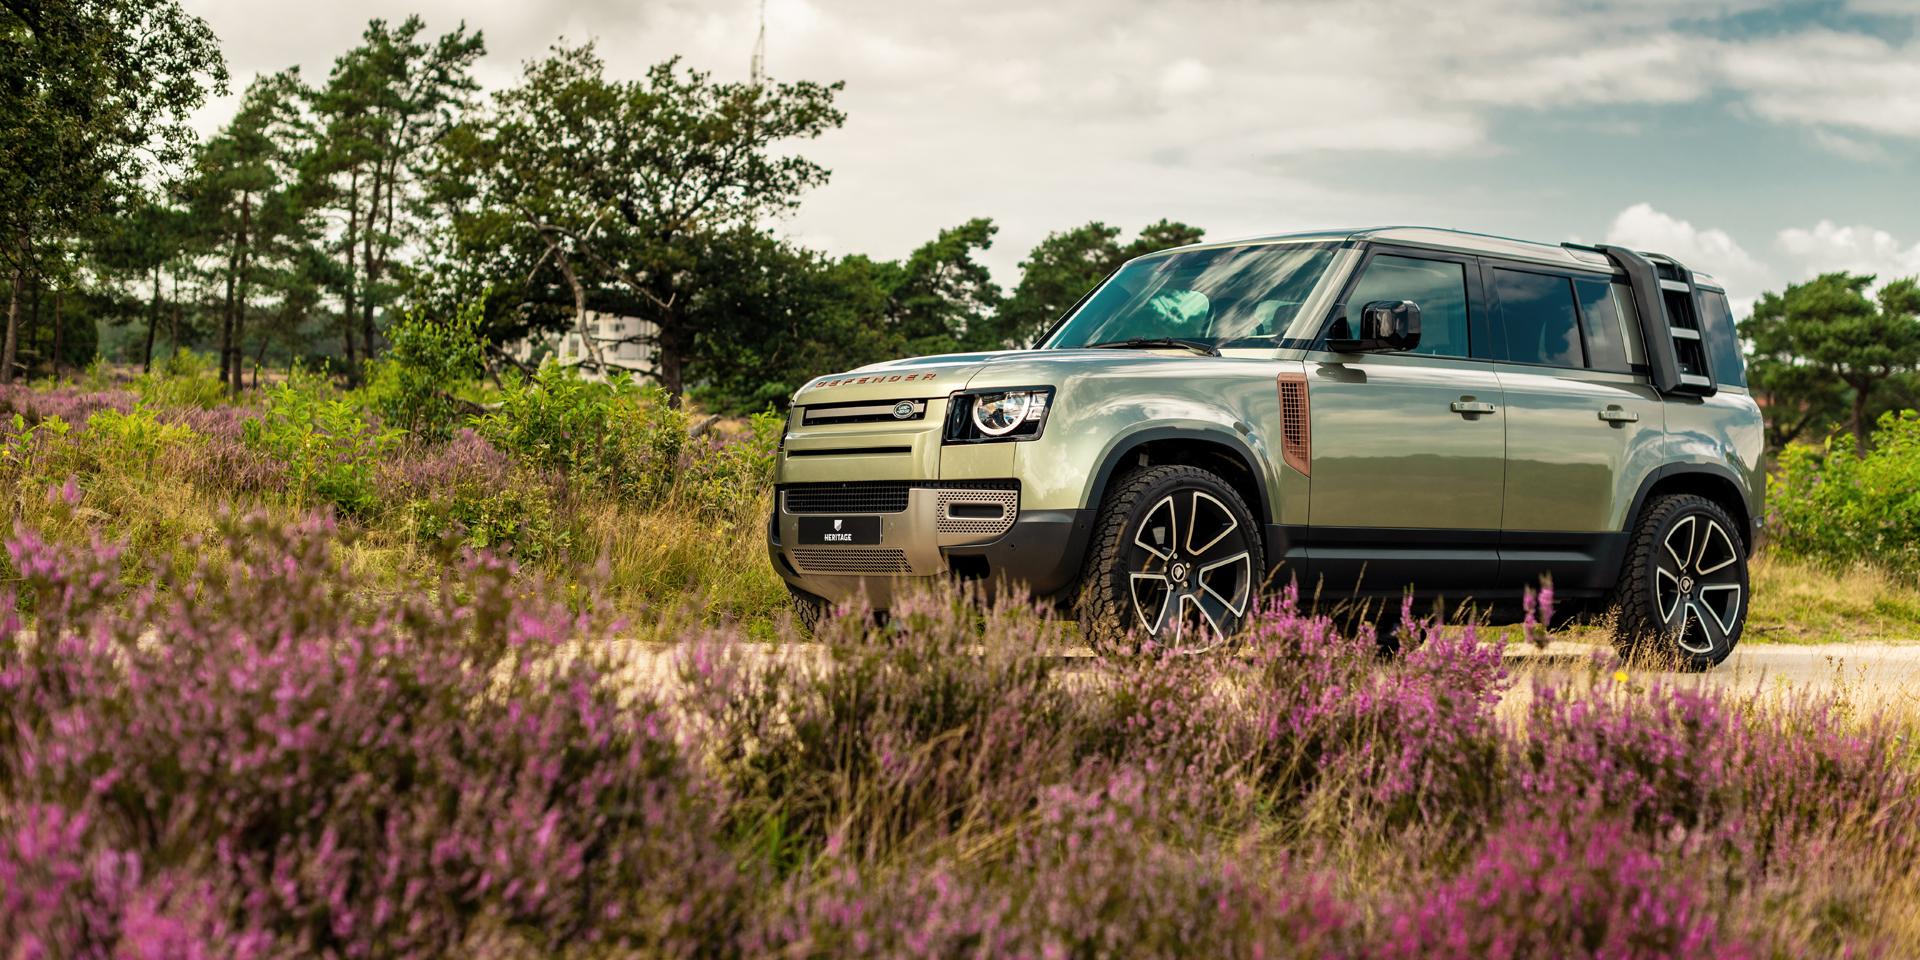 HERITAGE CUSTOMS VALIANCE VERDIGRIS – New Land Rover Defender